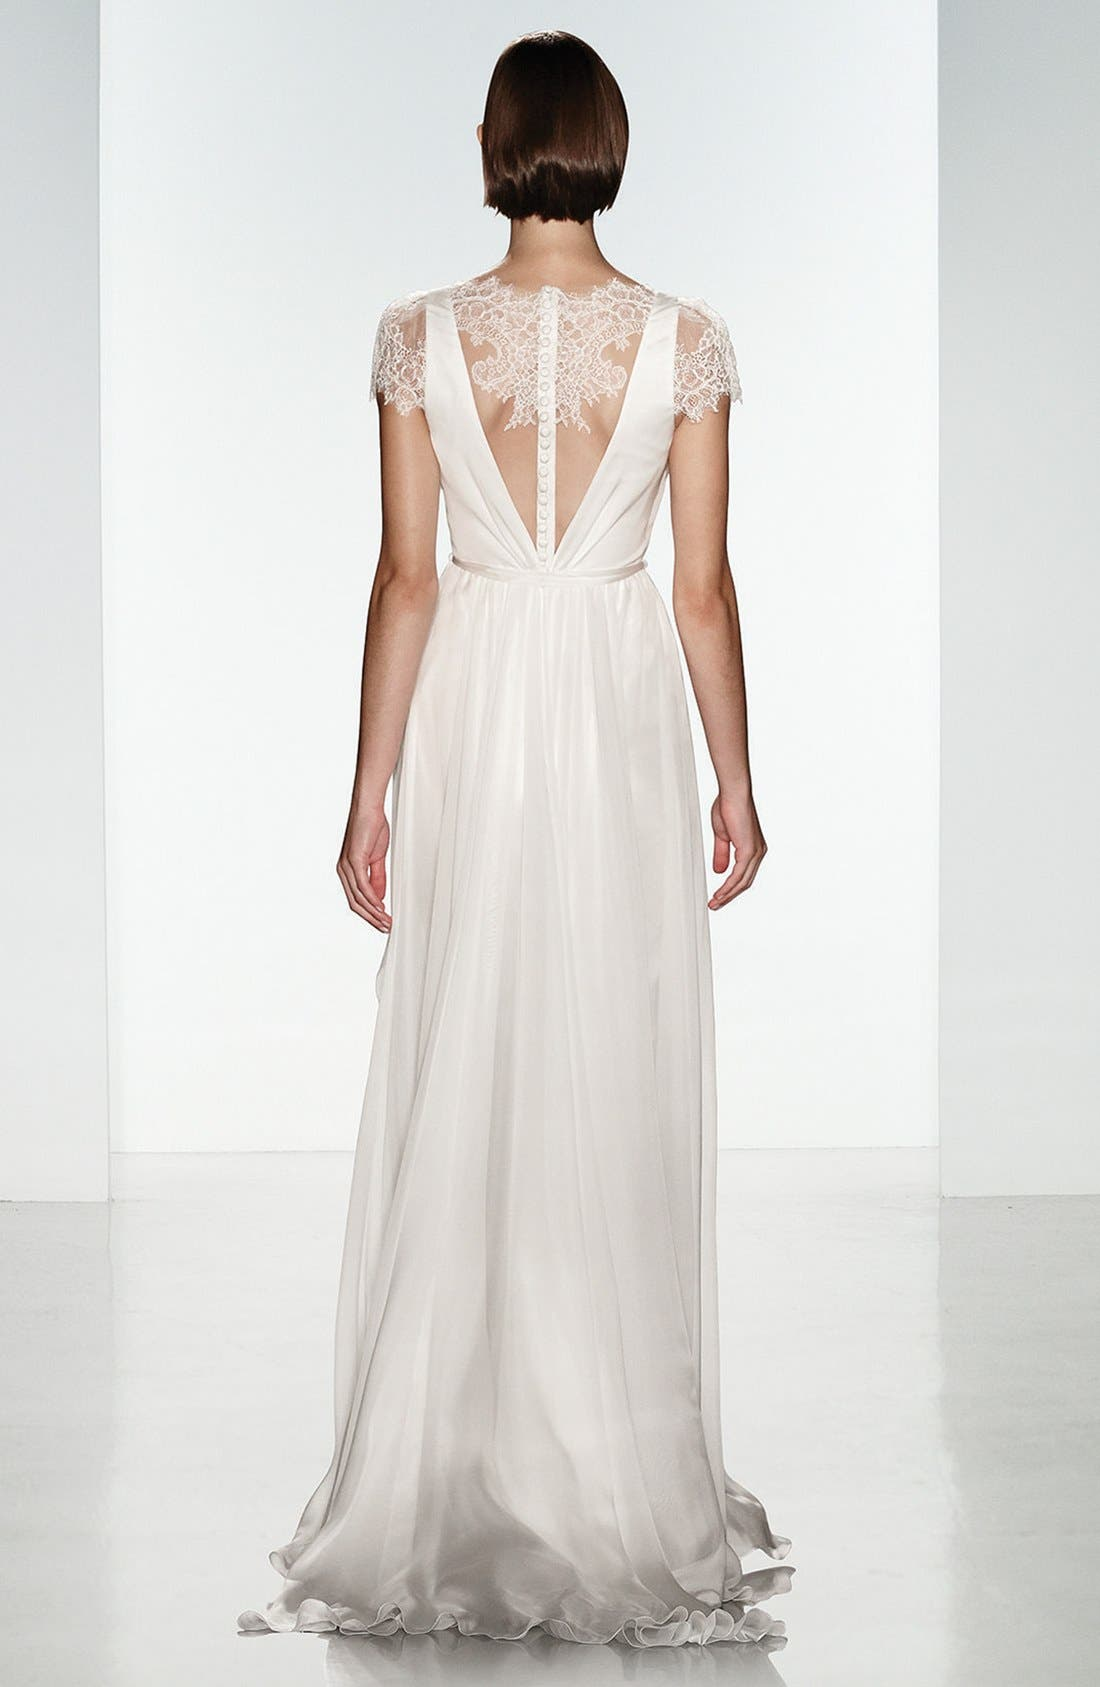 Lainee Silk Chiffon & Lace Cap Sleeve Gown,                             Alternate thumbnail 3, color,                             900